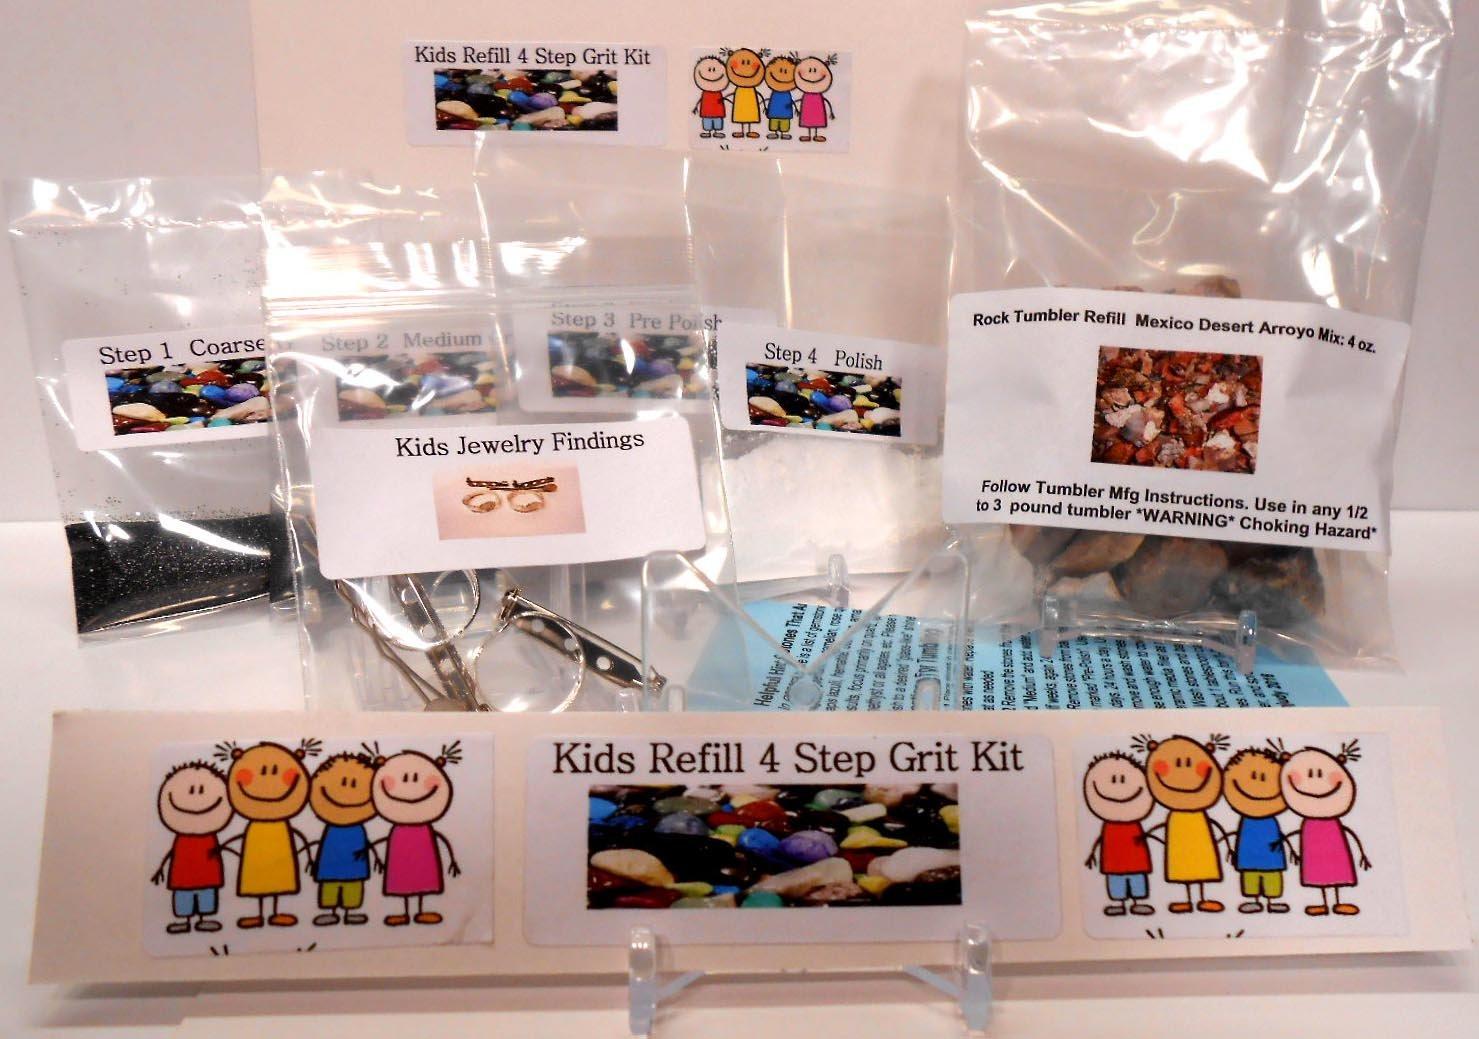 Amazon Kids Kidz Gritz Refill Rock Tumbler Grit Kit Polishes